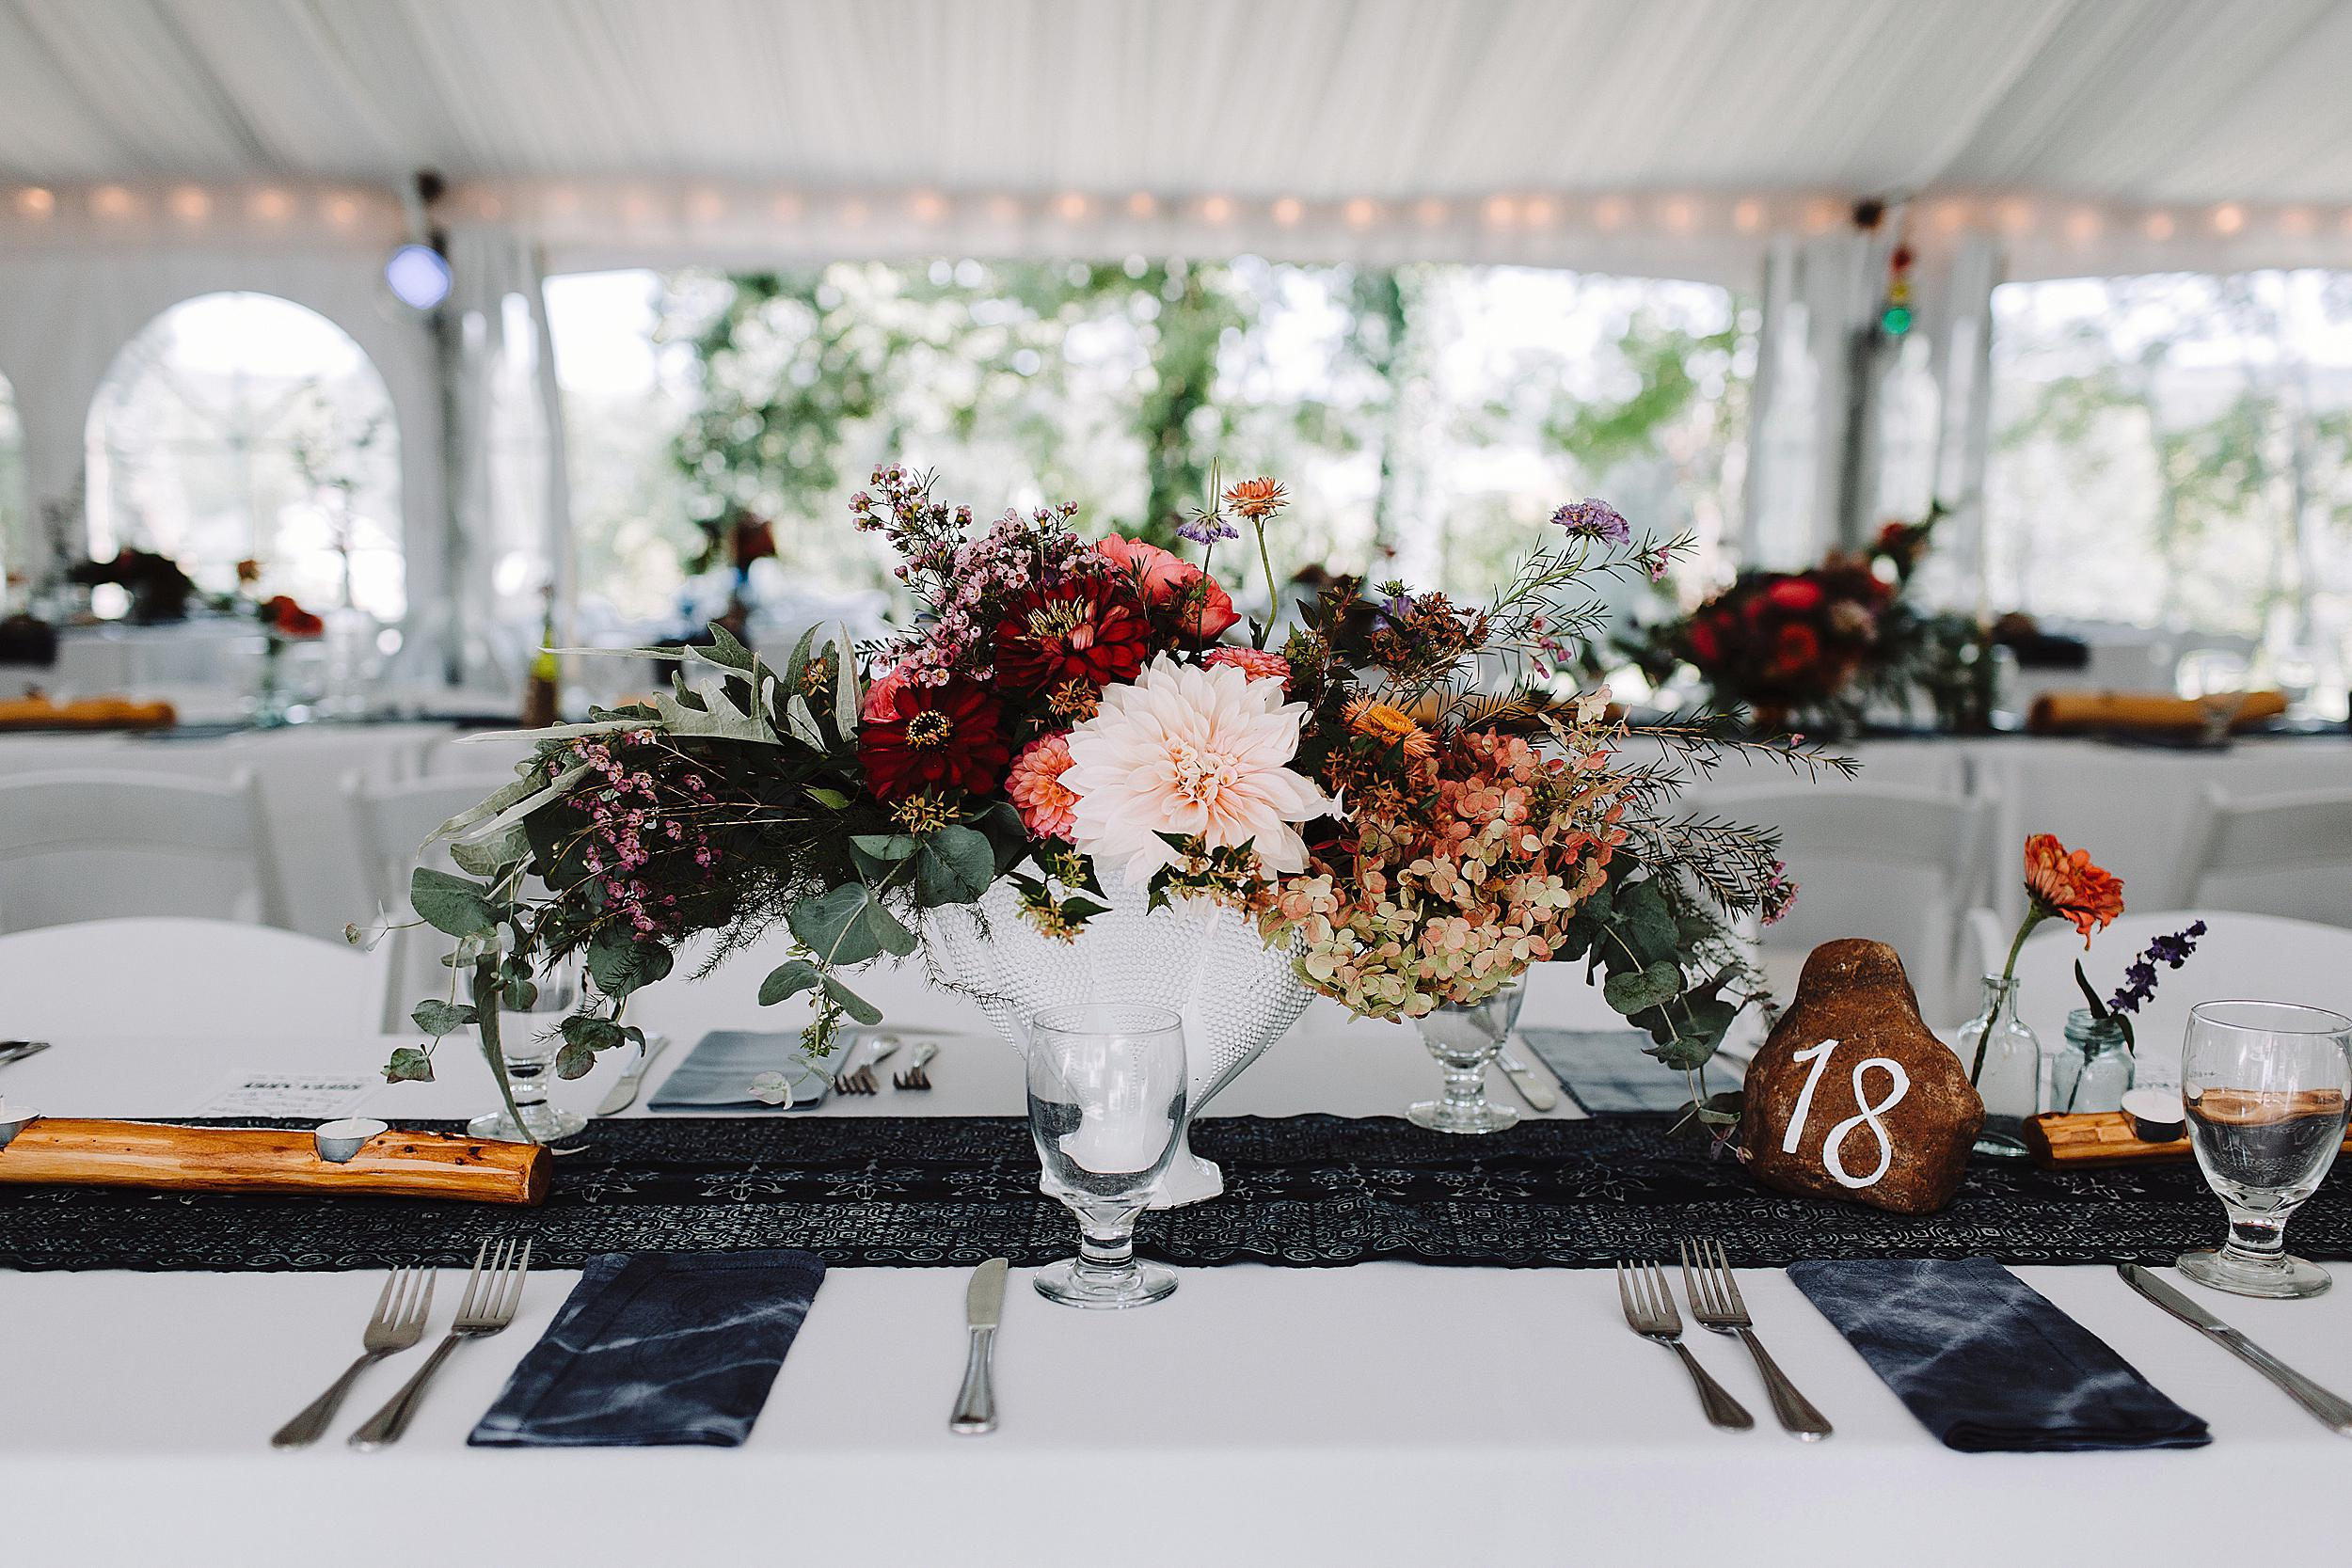 historic_shady_lane_wedding_with_love_and_embers-015.JPG